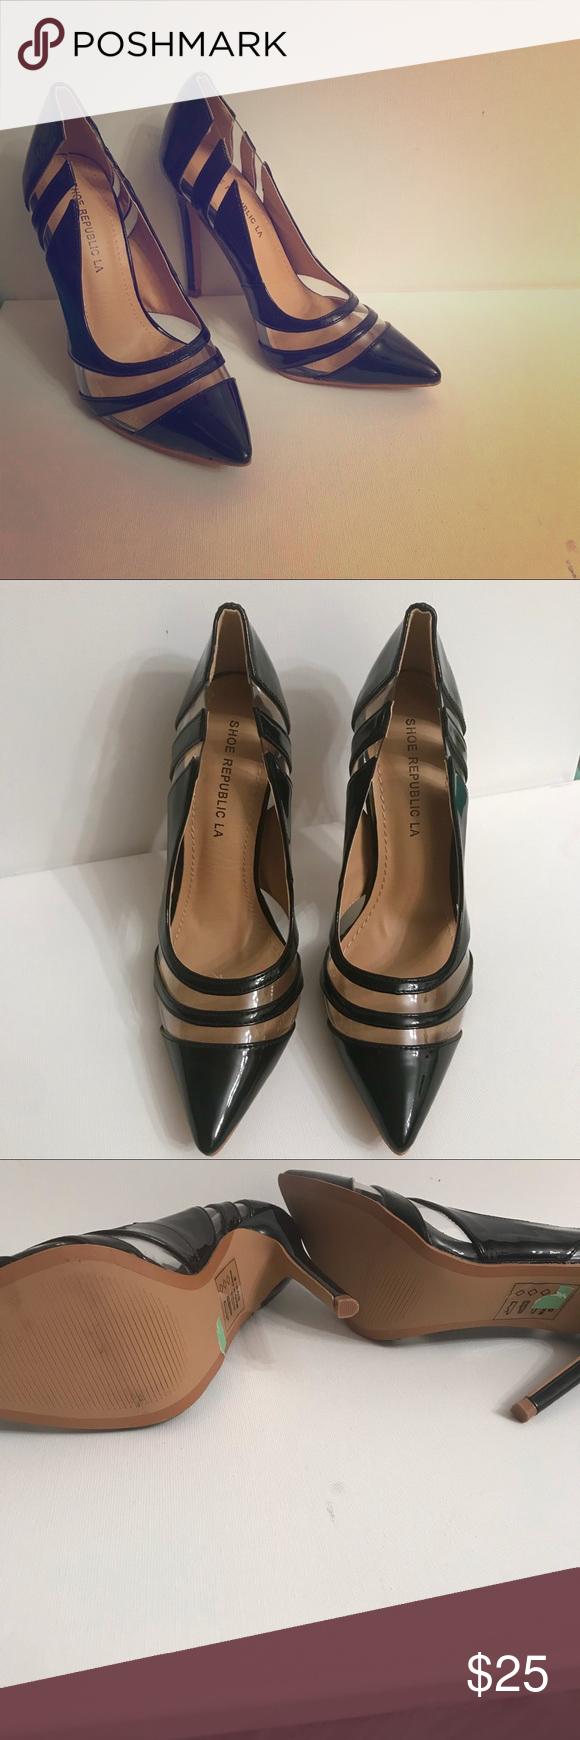 2bba8ac5b6b Shoe Republica | Black & Clear Heels Size 6 heels Rarely Worn No scuffs  Shoe Republic LA Shoes Heels